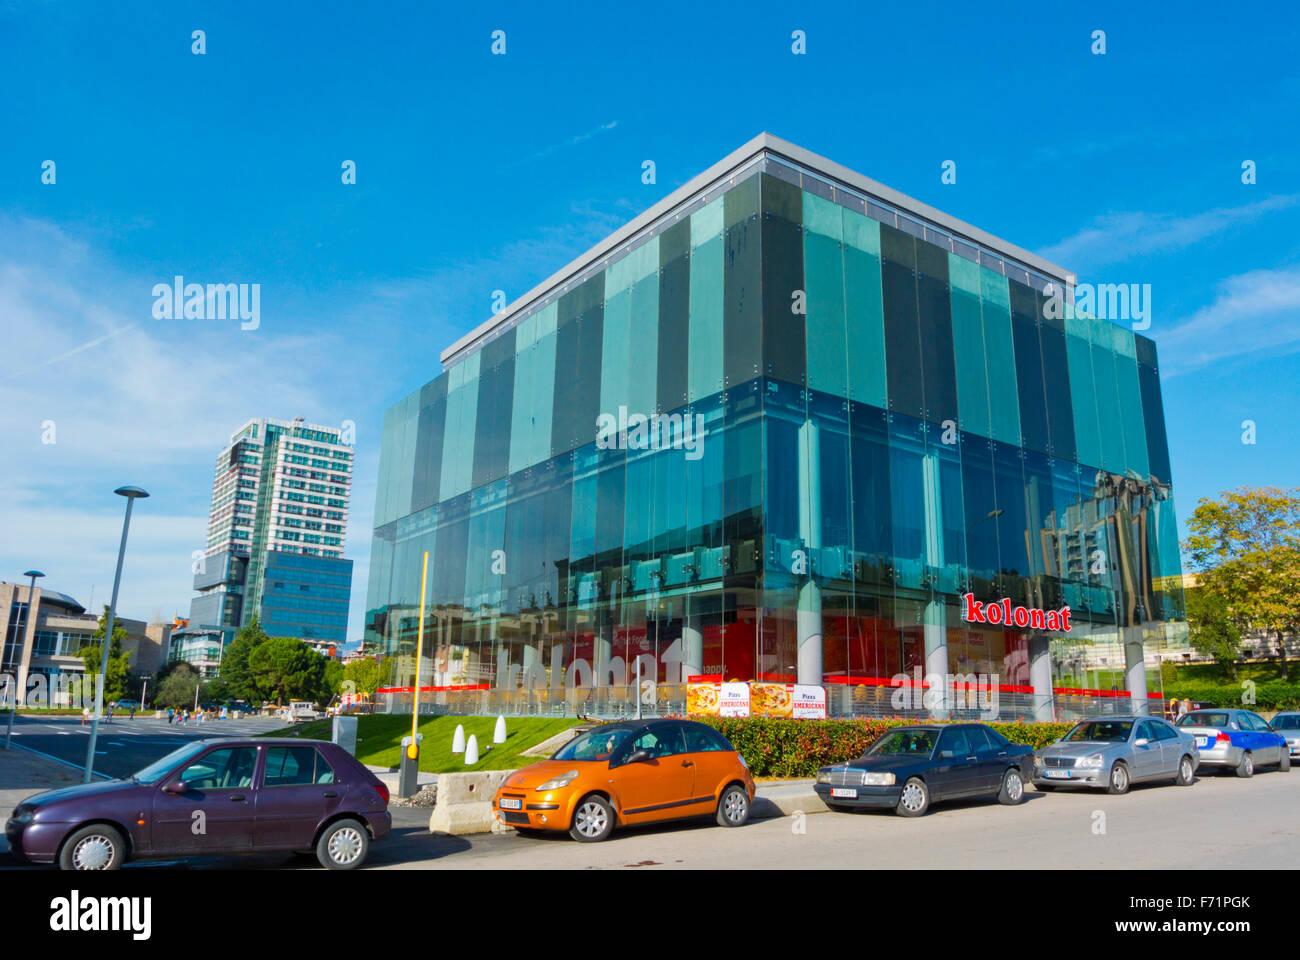 Kolonat restaurant complex, next to the stadium, Tirana, Albania - Stock Image